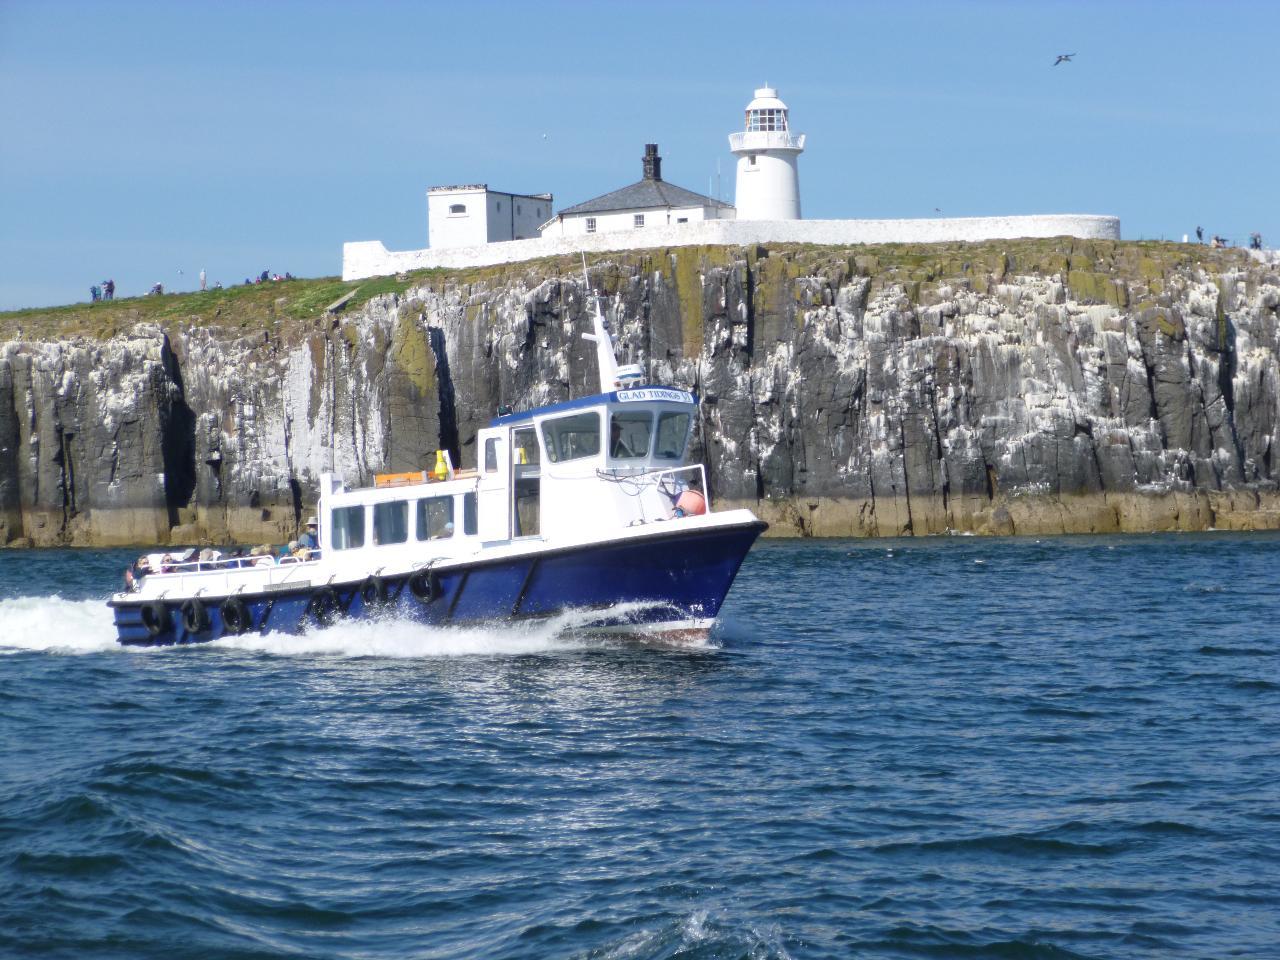 Inner Farne Boat Trip